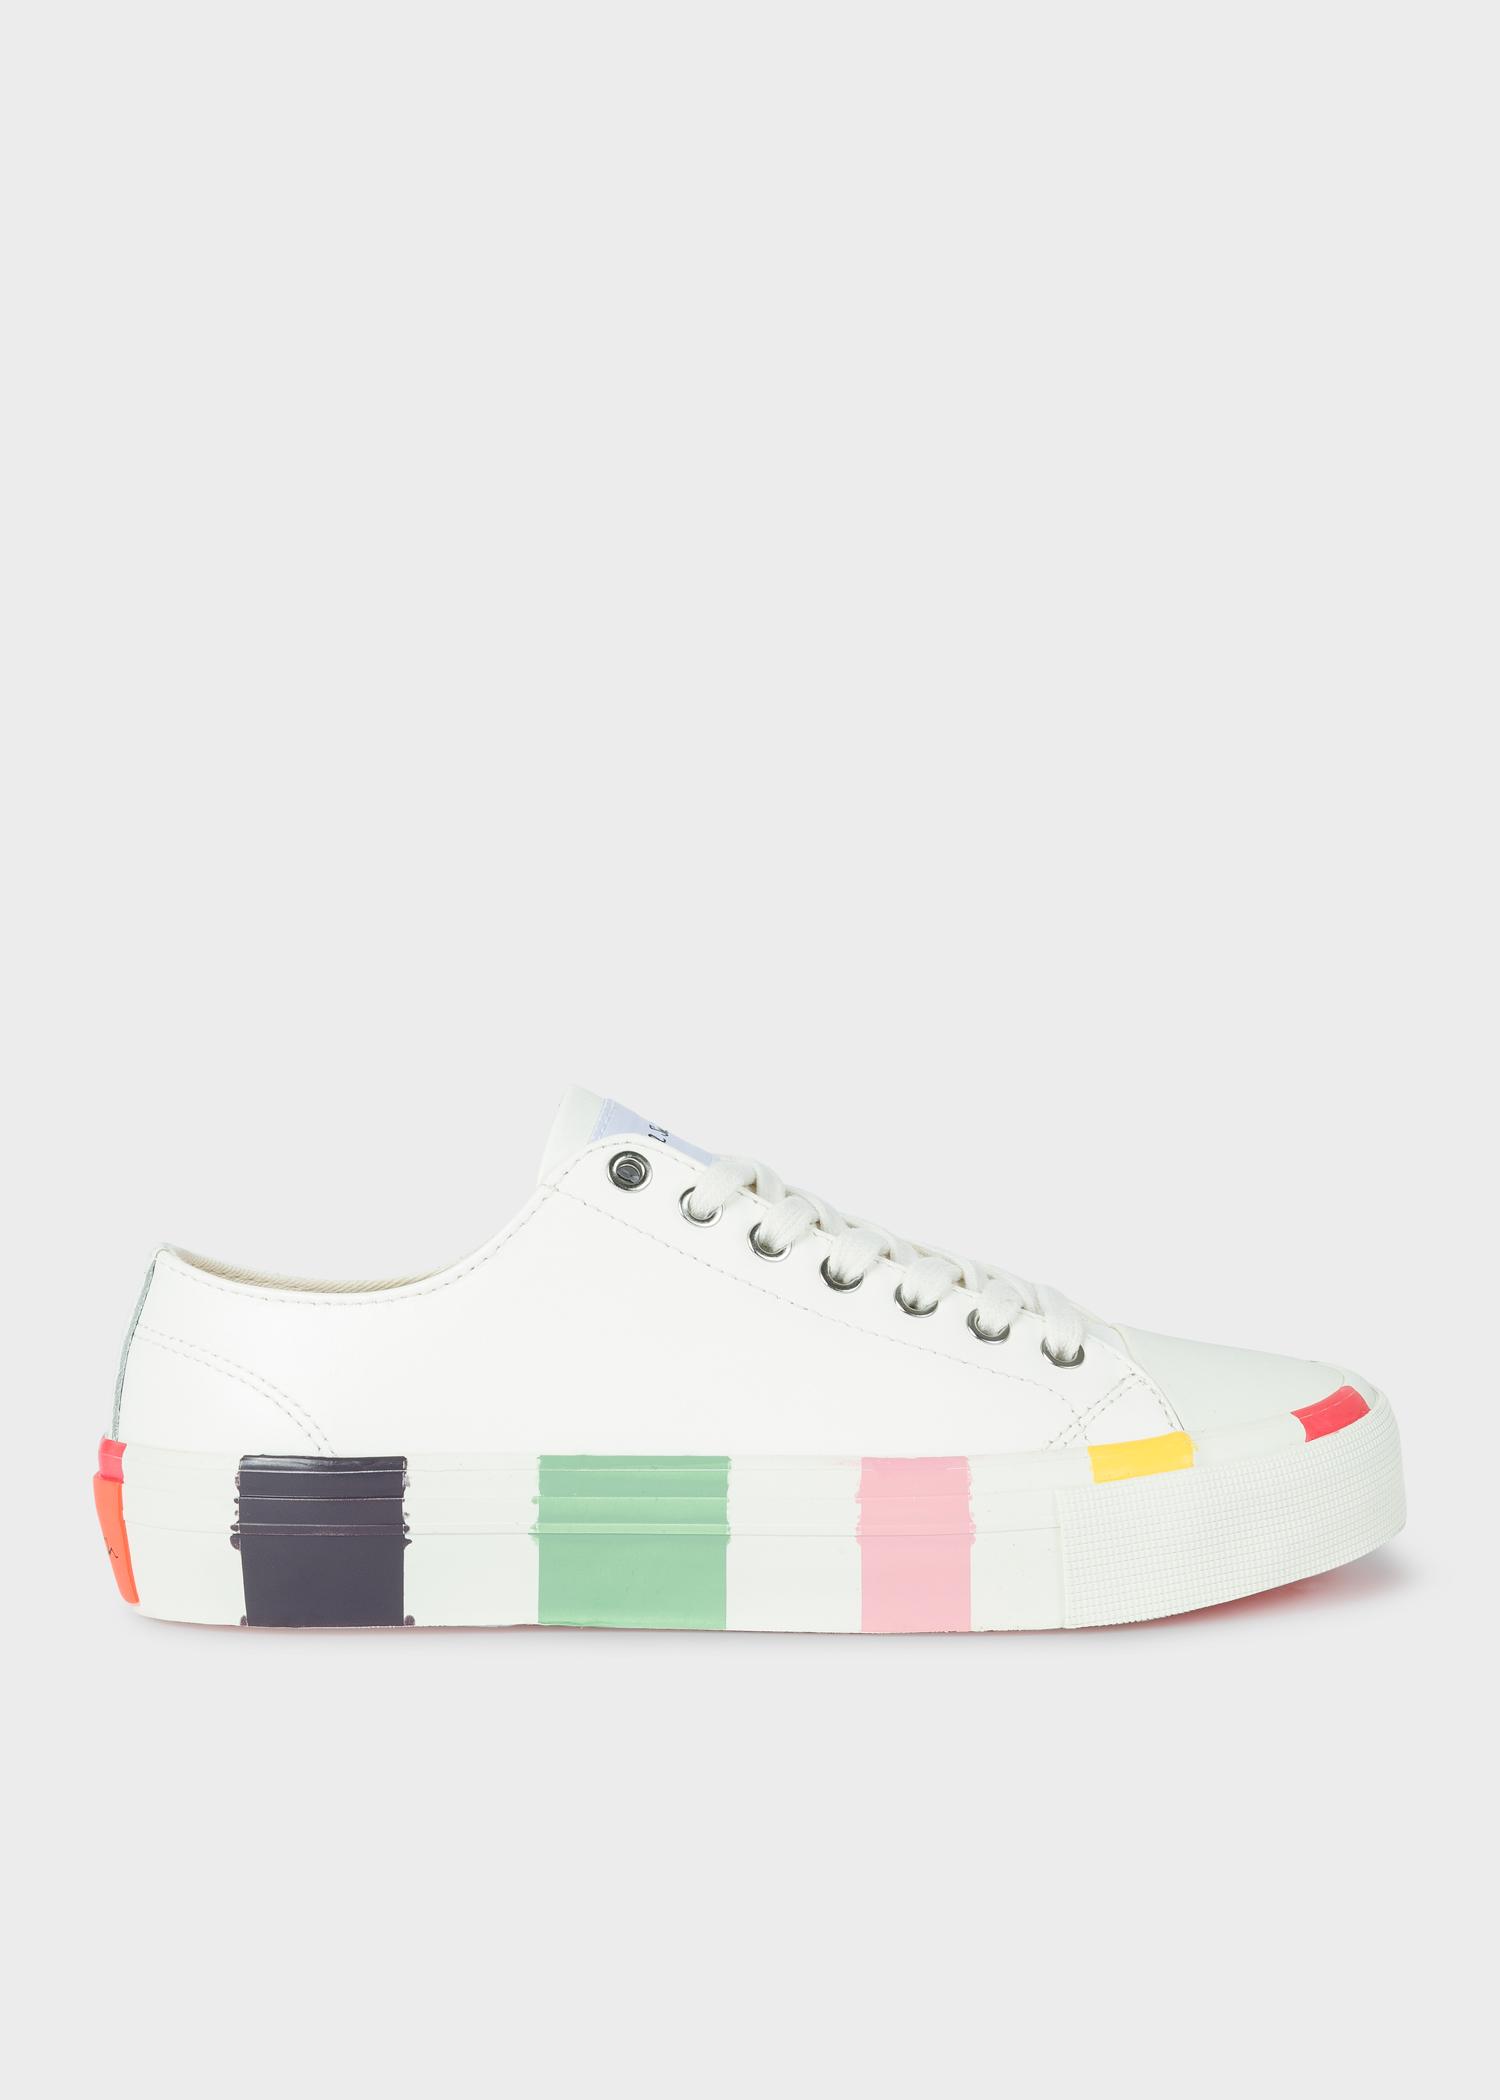 Femme Paul Semelles Baskets Blanches 'nolan' Multicolores En Cuir mn08wNv